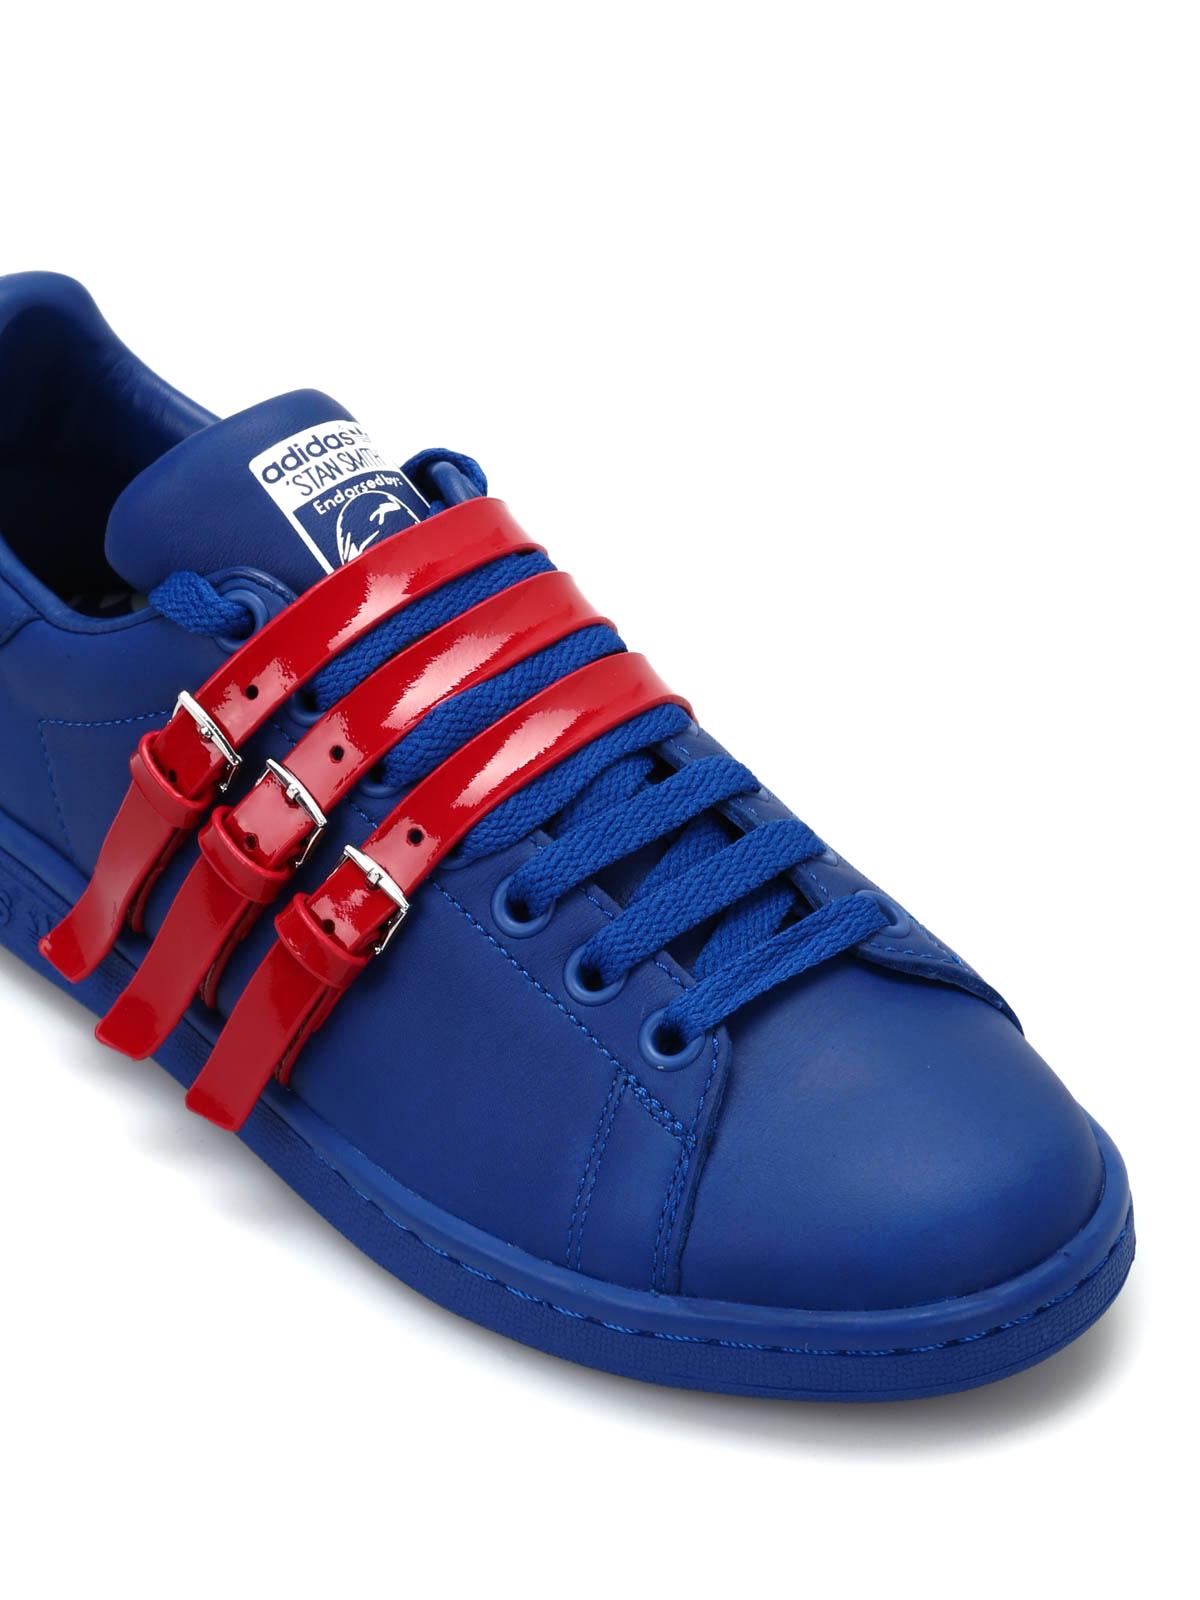 watch 81f68 61f48 Adidas - Raf Simons Stan Smith Strap - trainers .